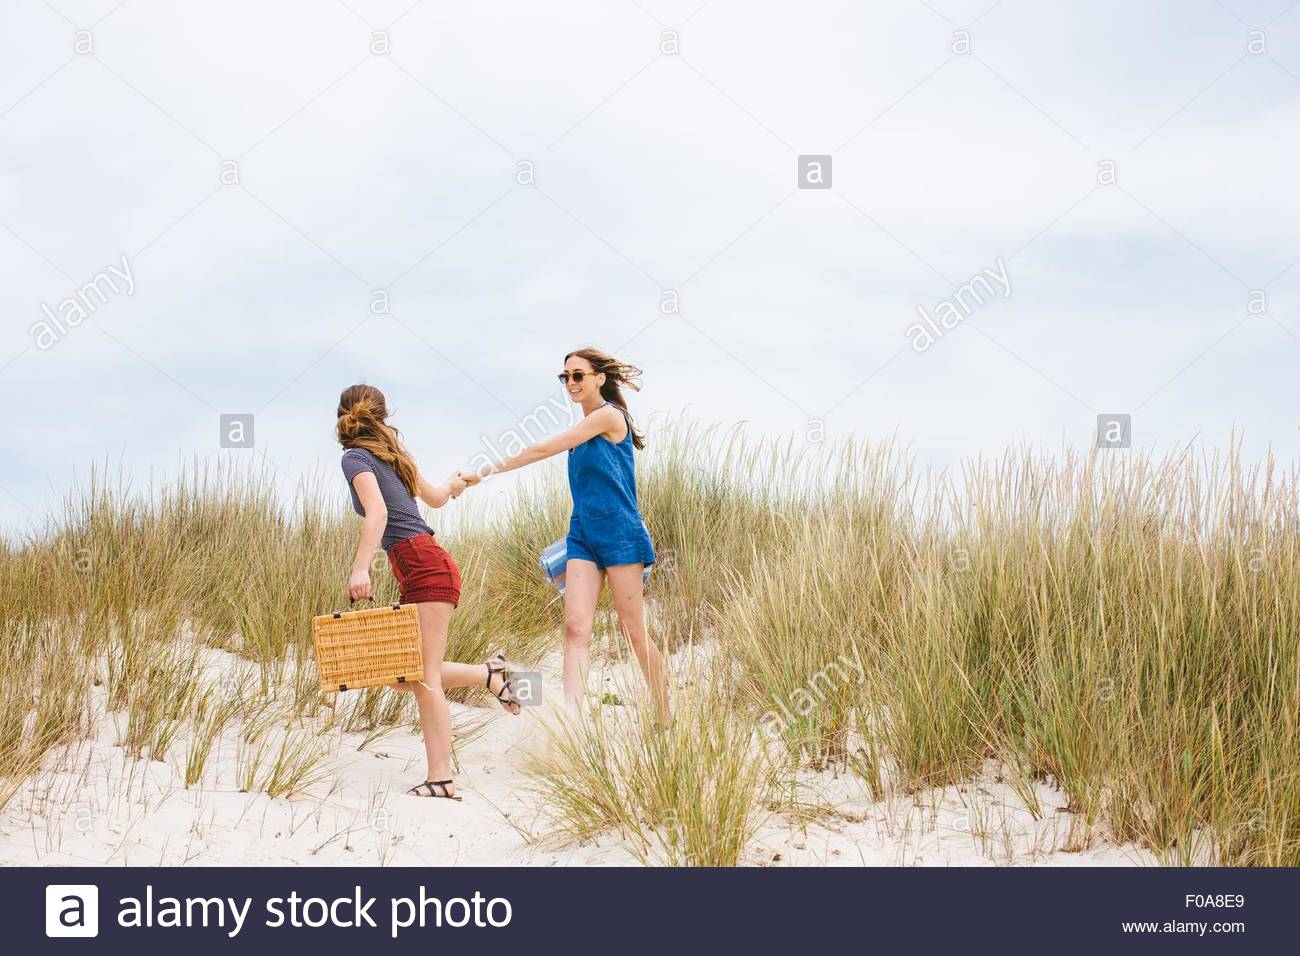 Zwei junge Freundinnen Picknick Korb Hand in Hand auf Sanddünen Stockbild